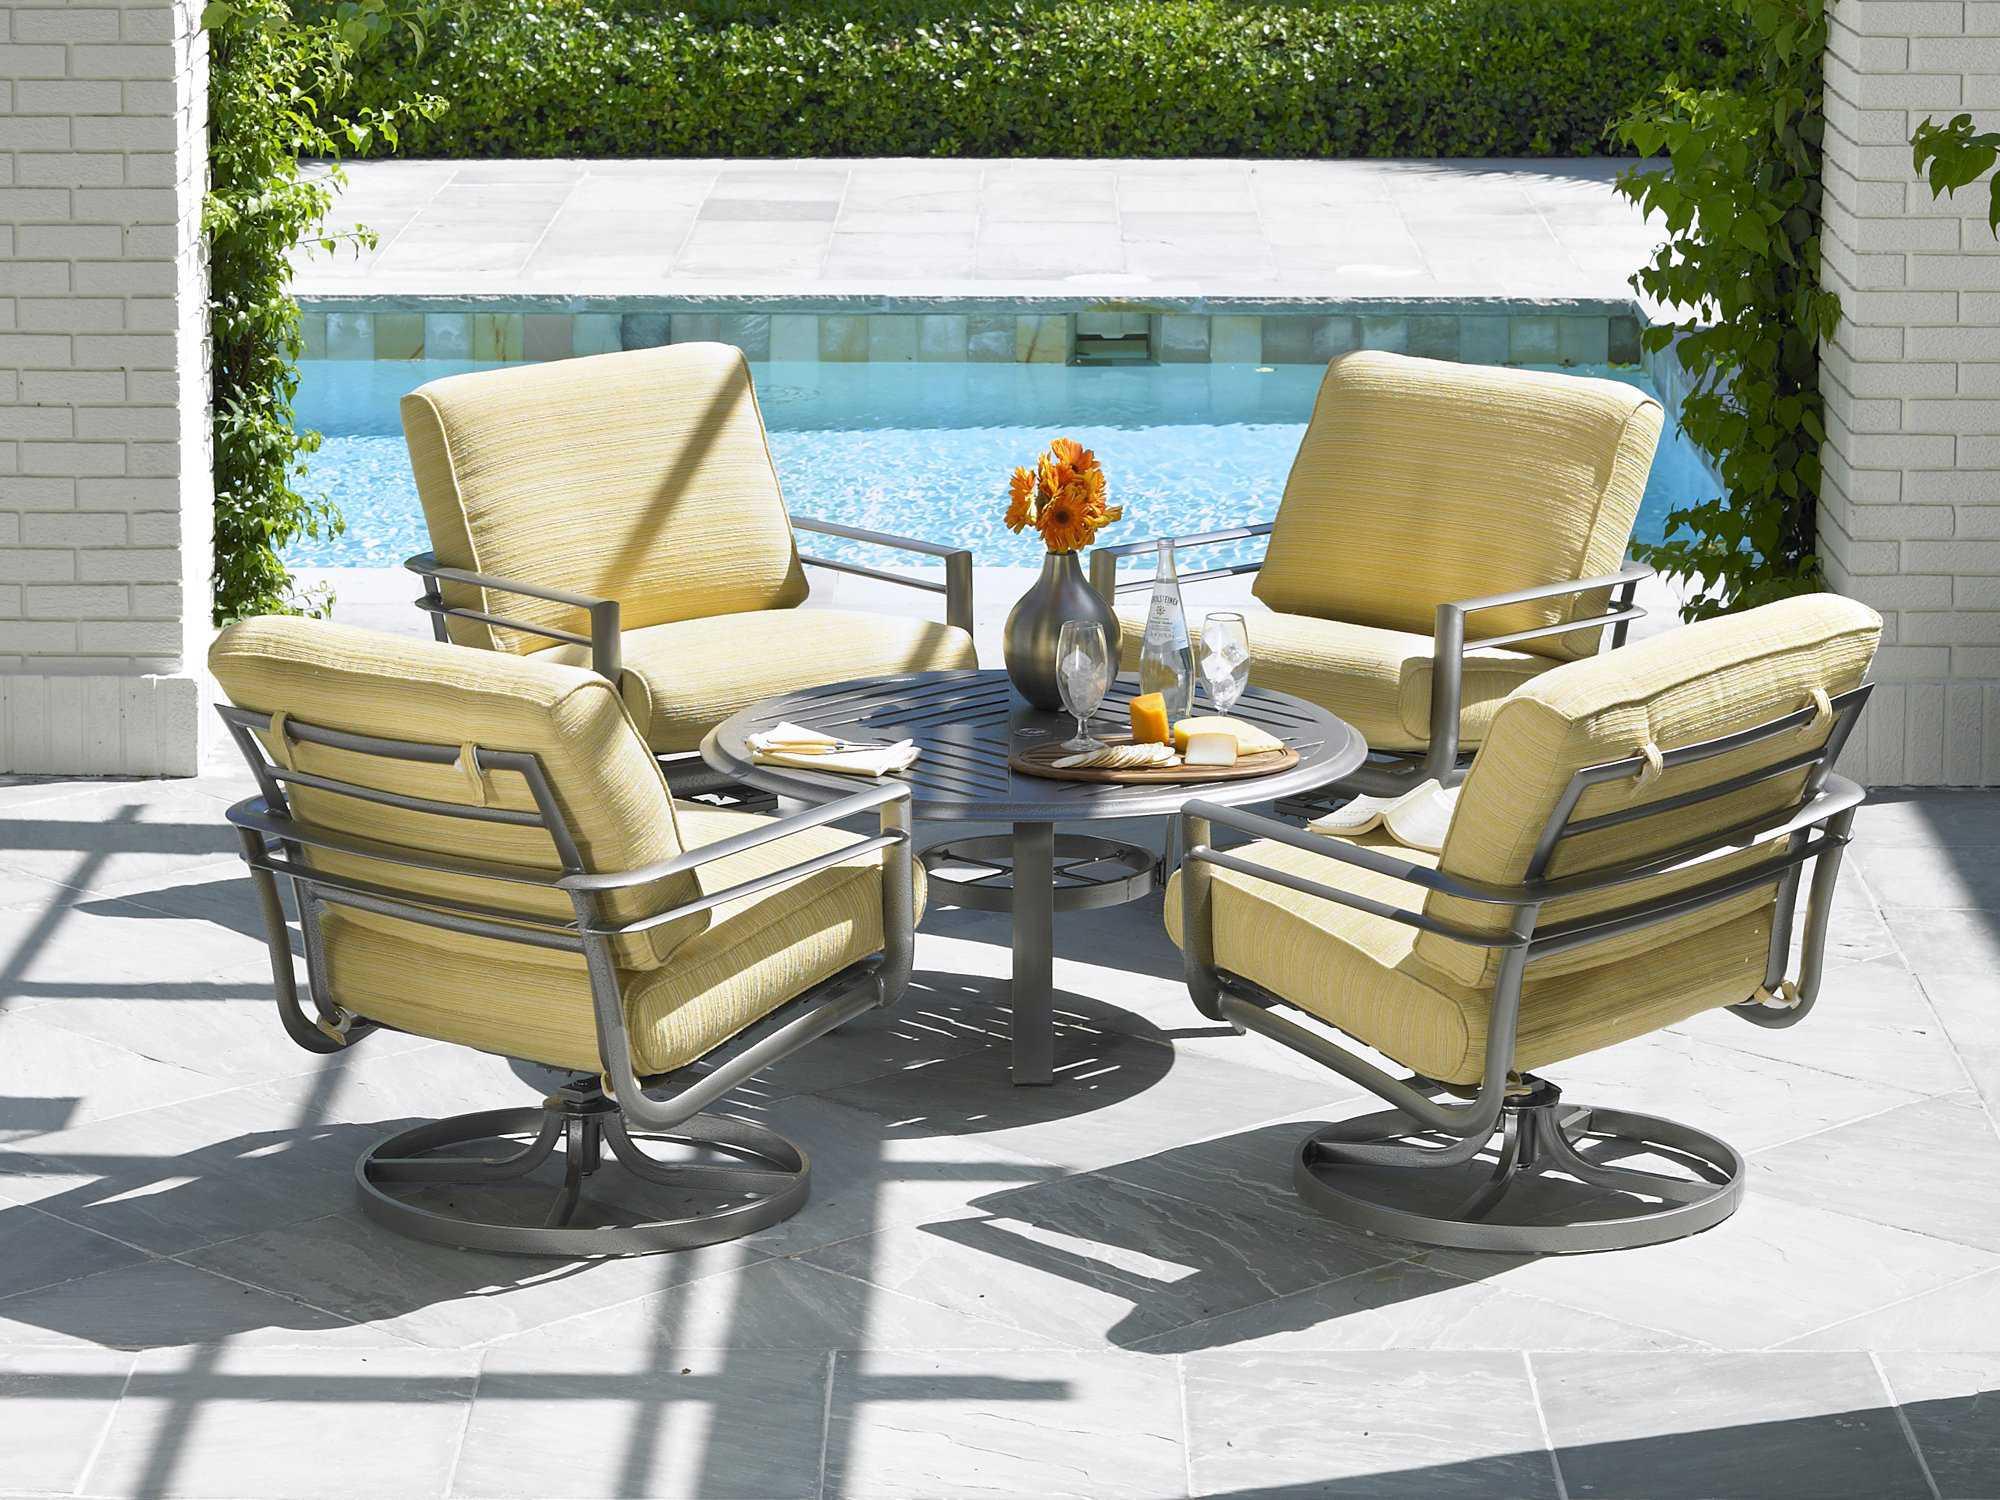 Winston Southern Cay Sling Aluminum Armless Chaise Lounge: Winston Southern Cay Cushion Aluminum Arm Swivel Lounge